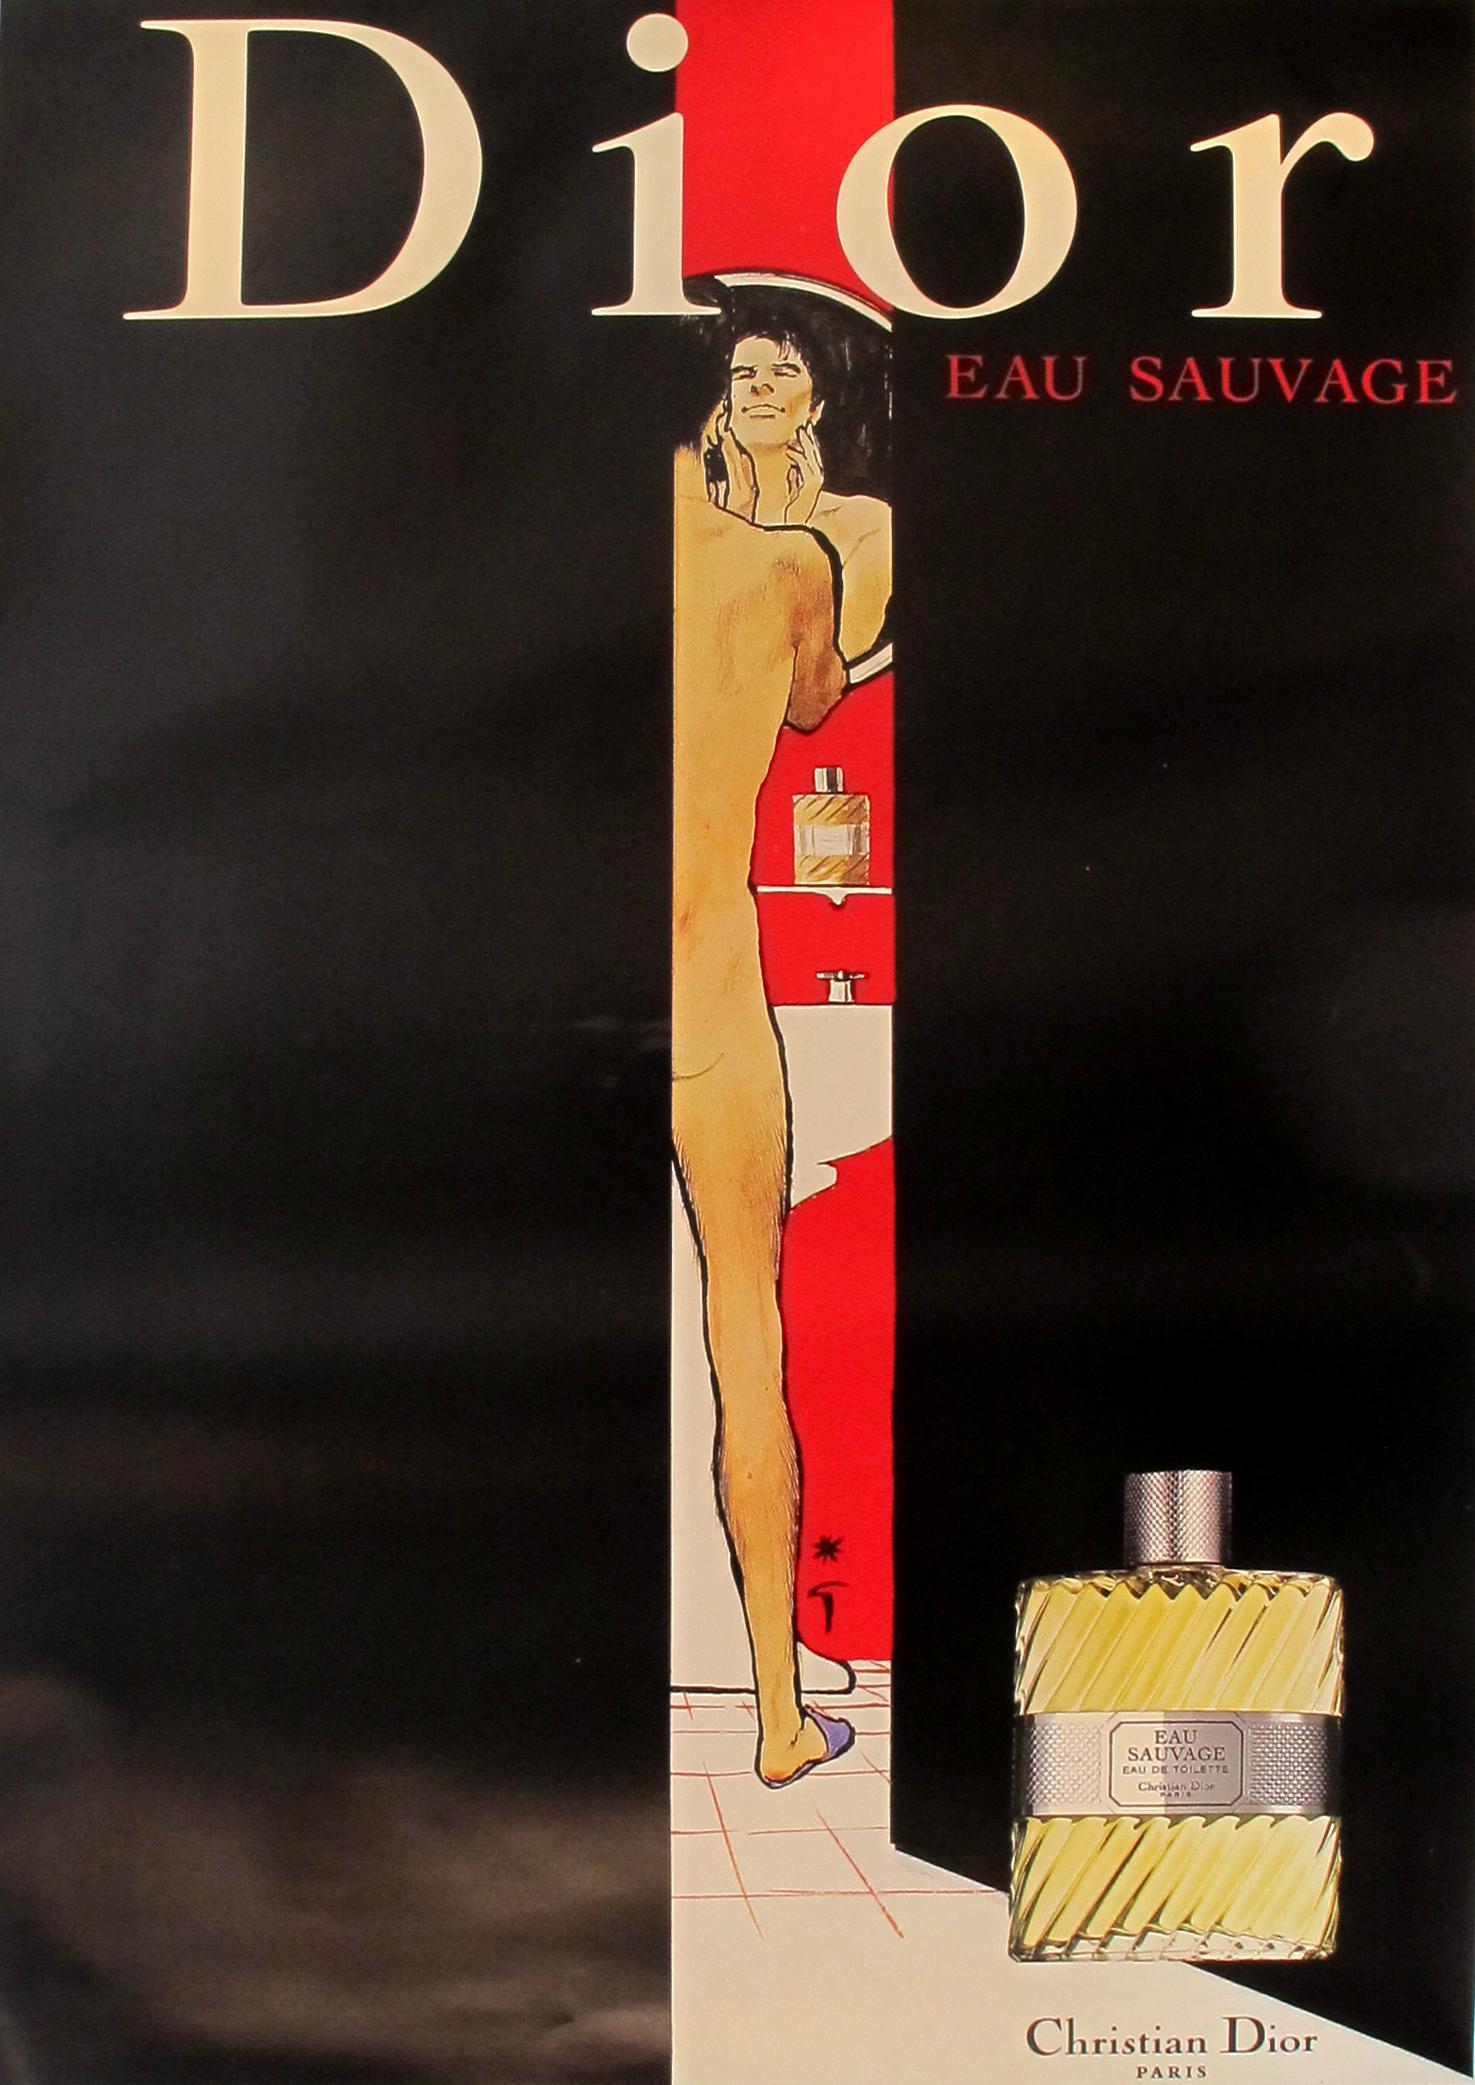 Vintage Christian Dior Eau Sauvage Perfume Poster Chairish